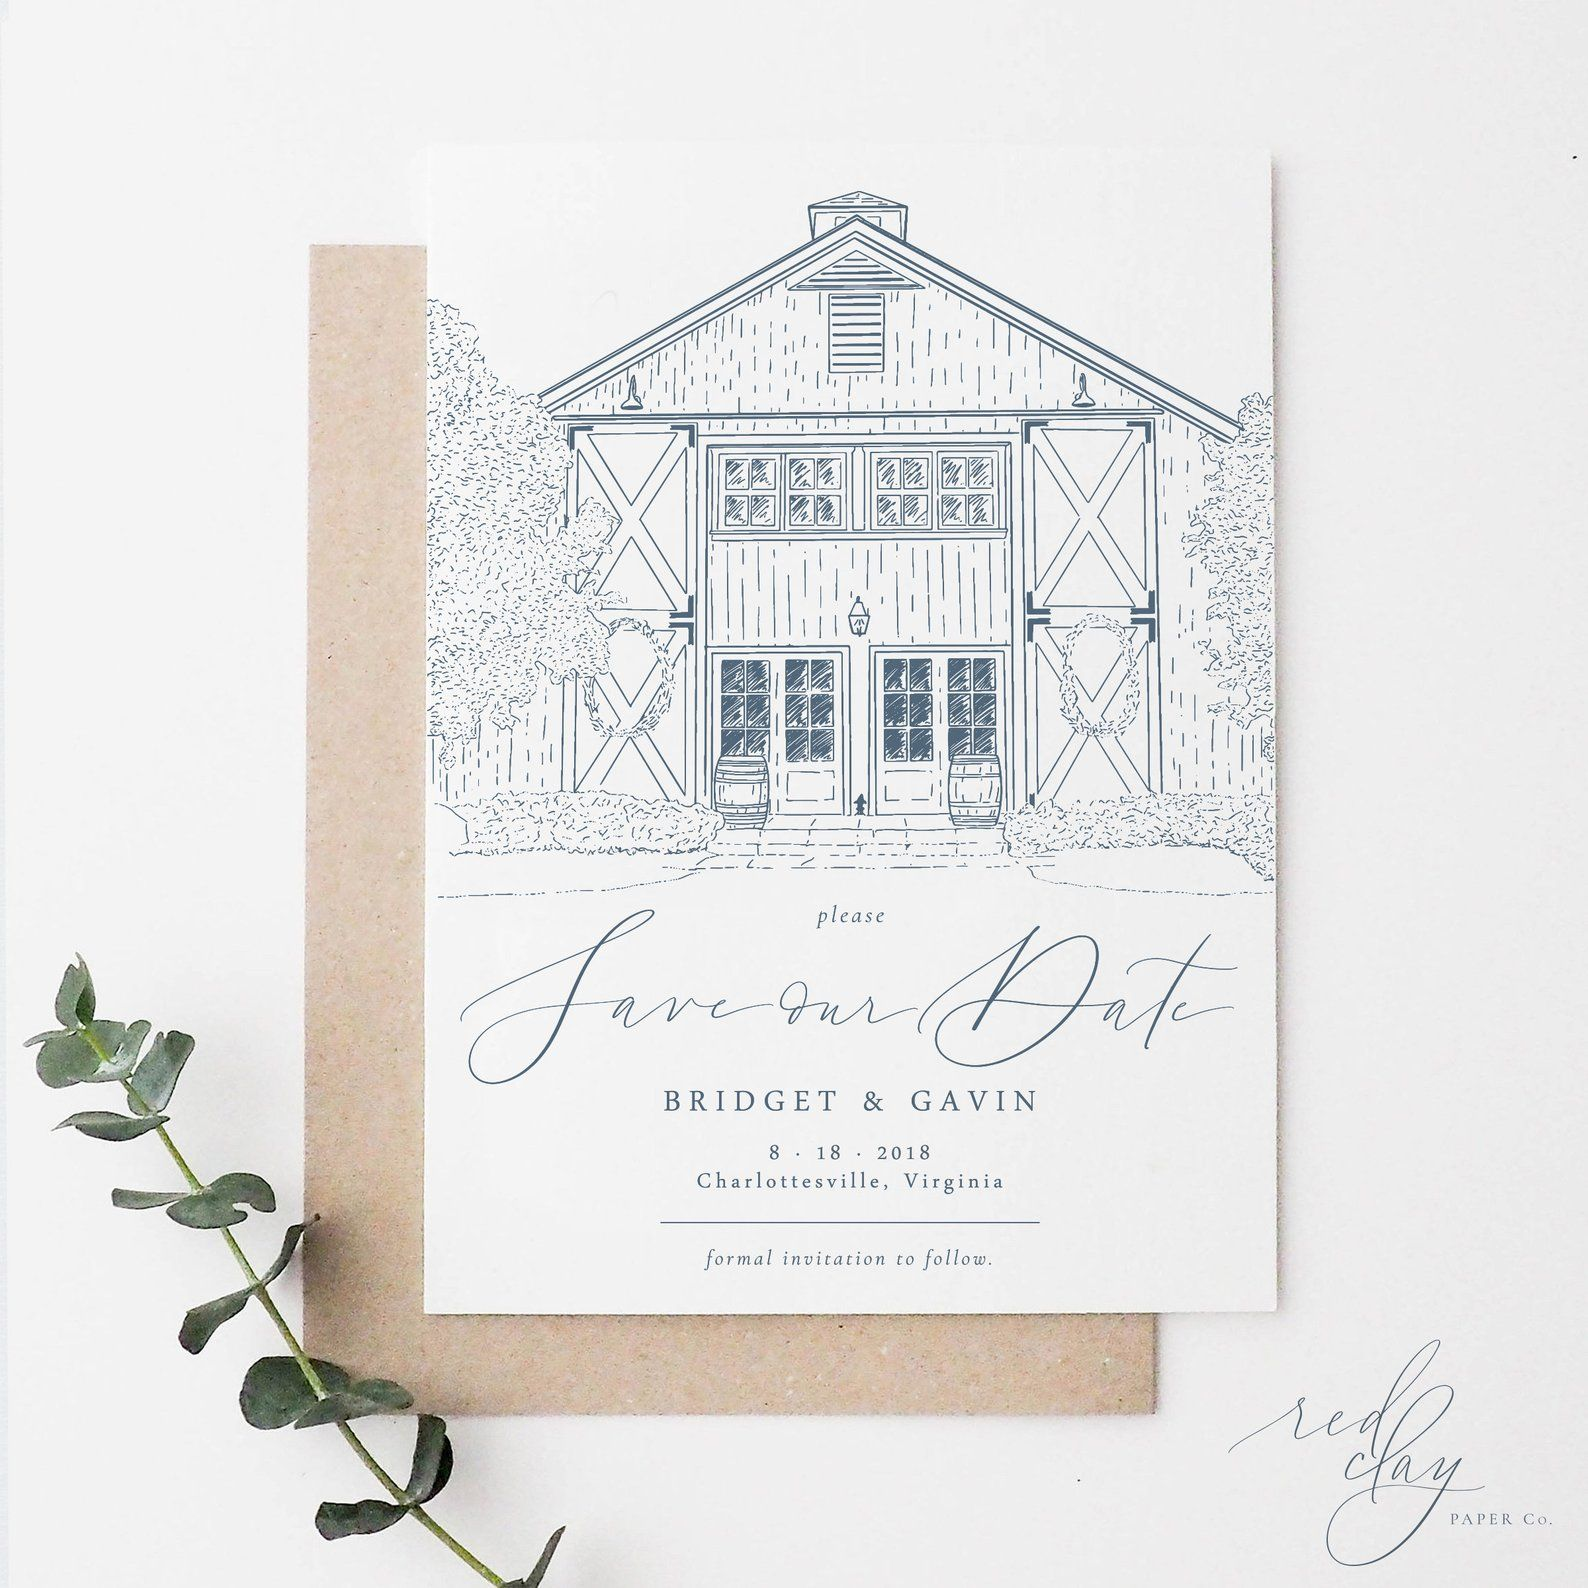 Custom Venue Save The Date Cards Wedding Venue Illustration